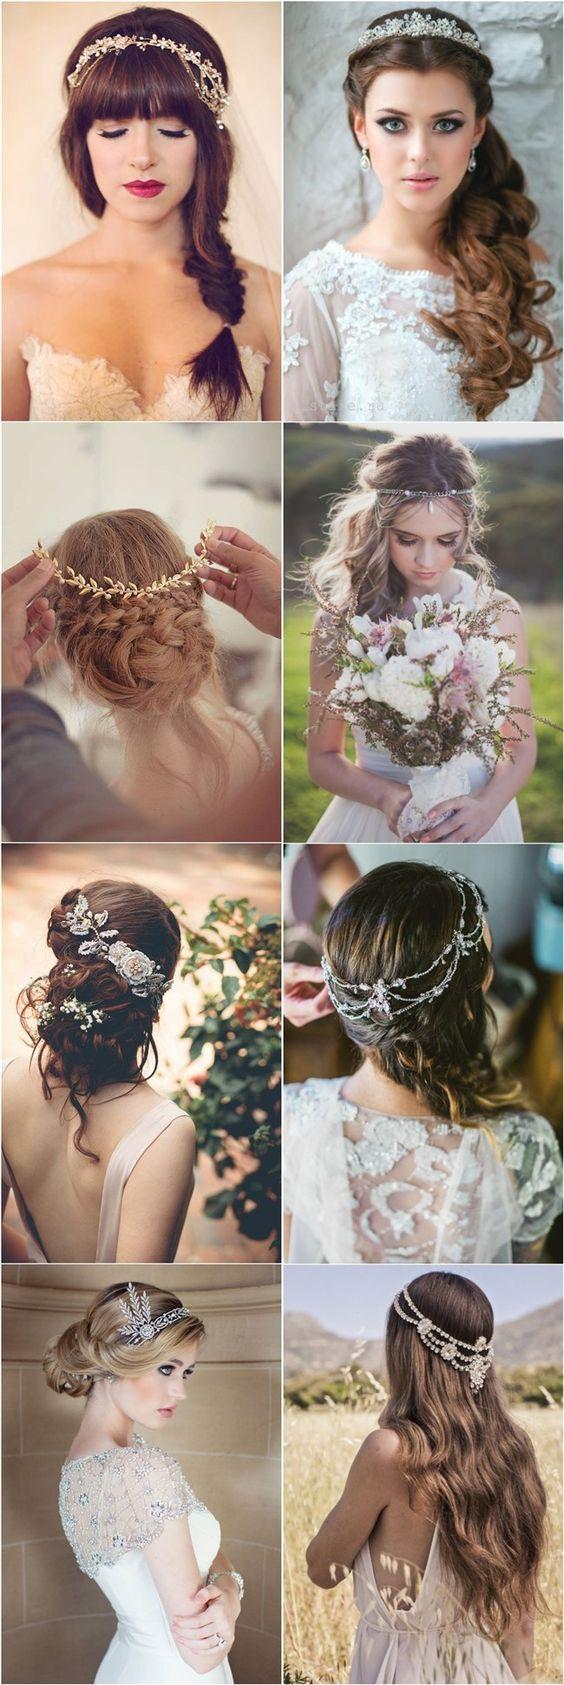 wedding hairstyles with wedding bridal headpieces / http://www.deerpearlflowers.com/amazing-wedding-hairstyles-with-headpiece/2/: